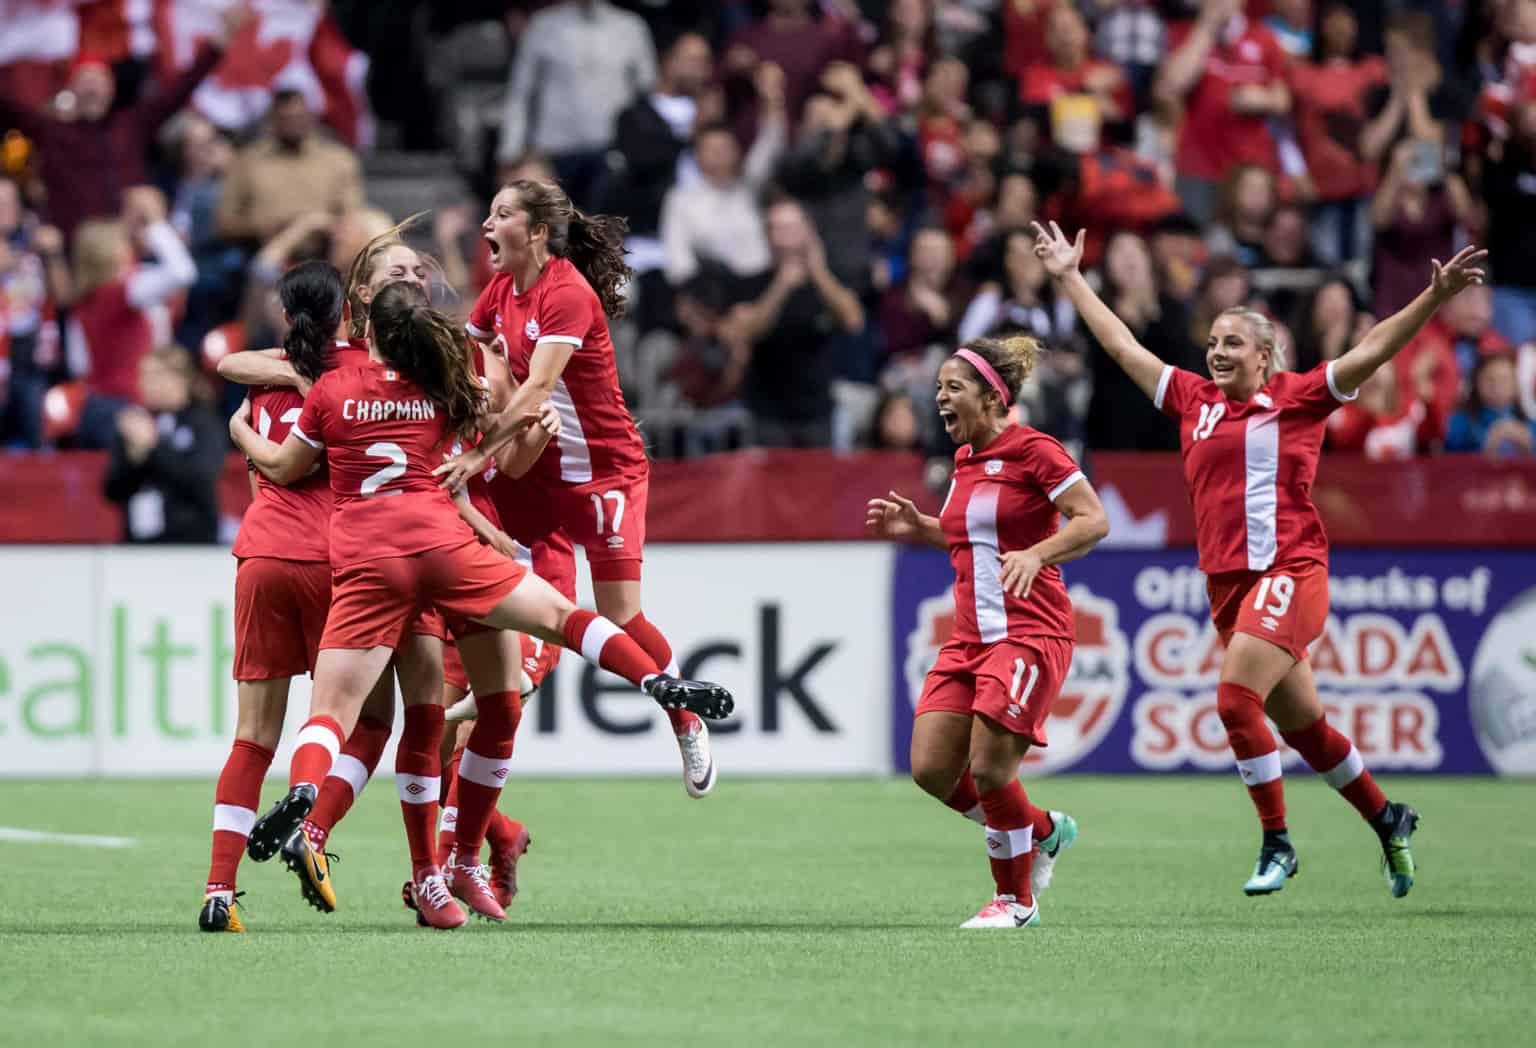 womens_soccer_gold